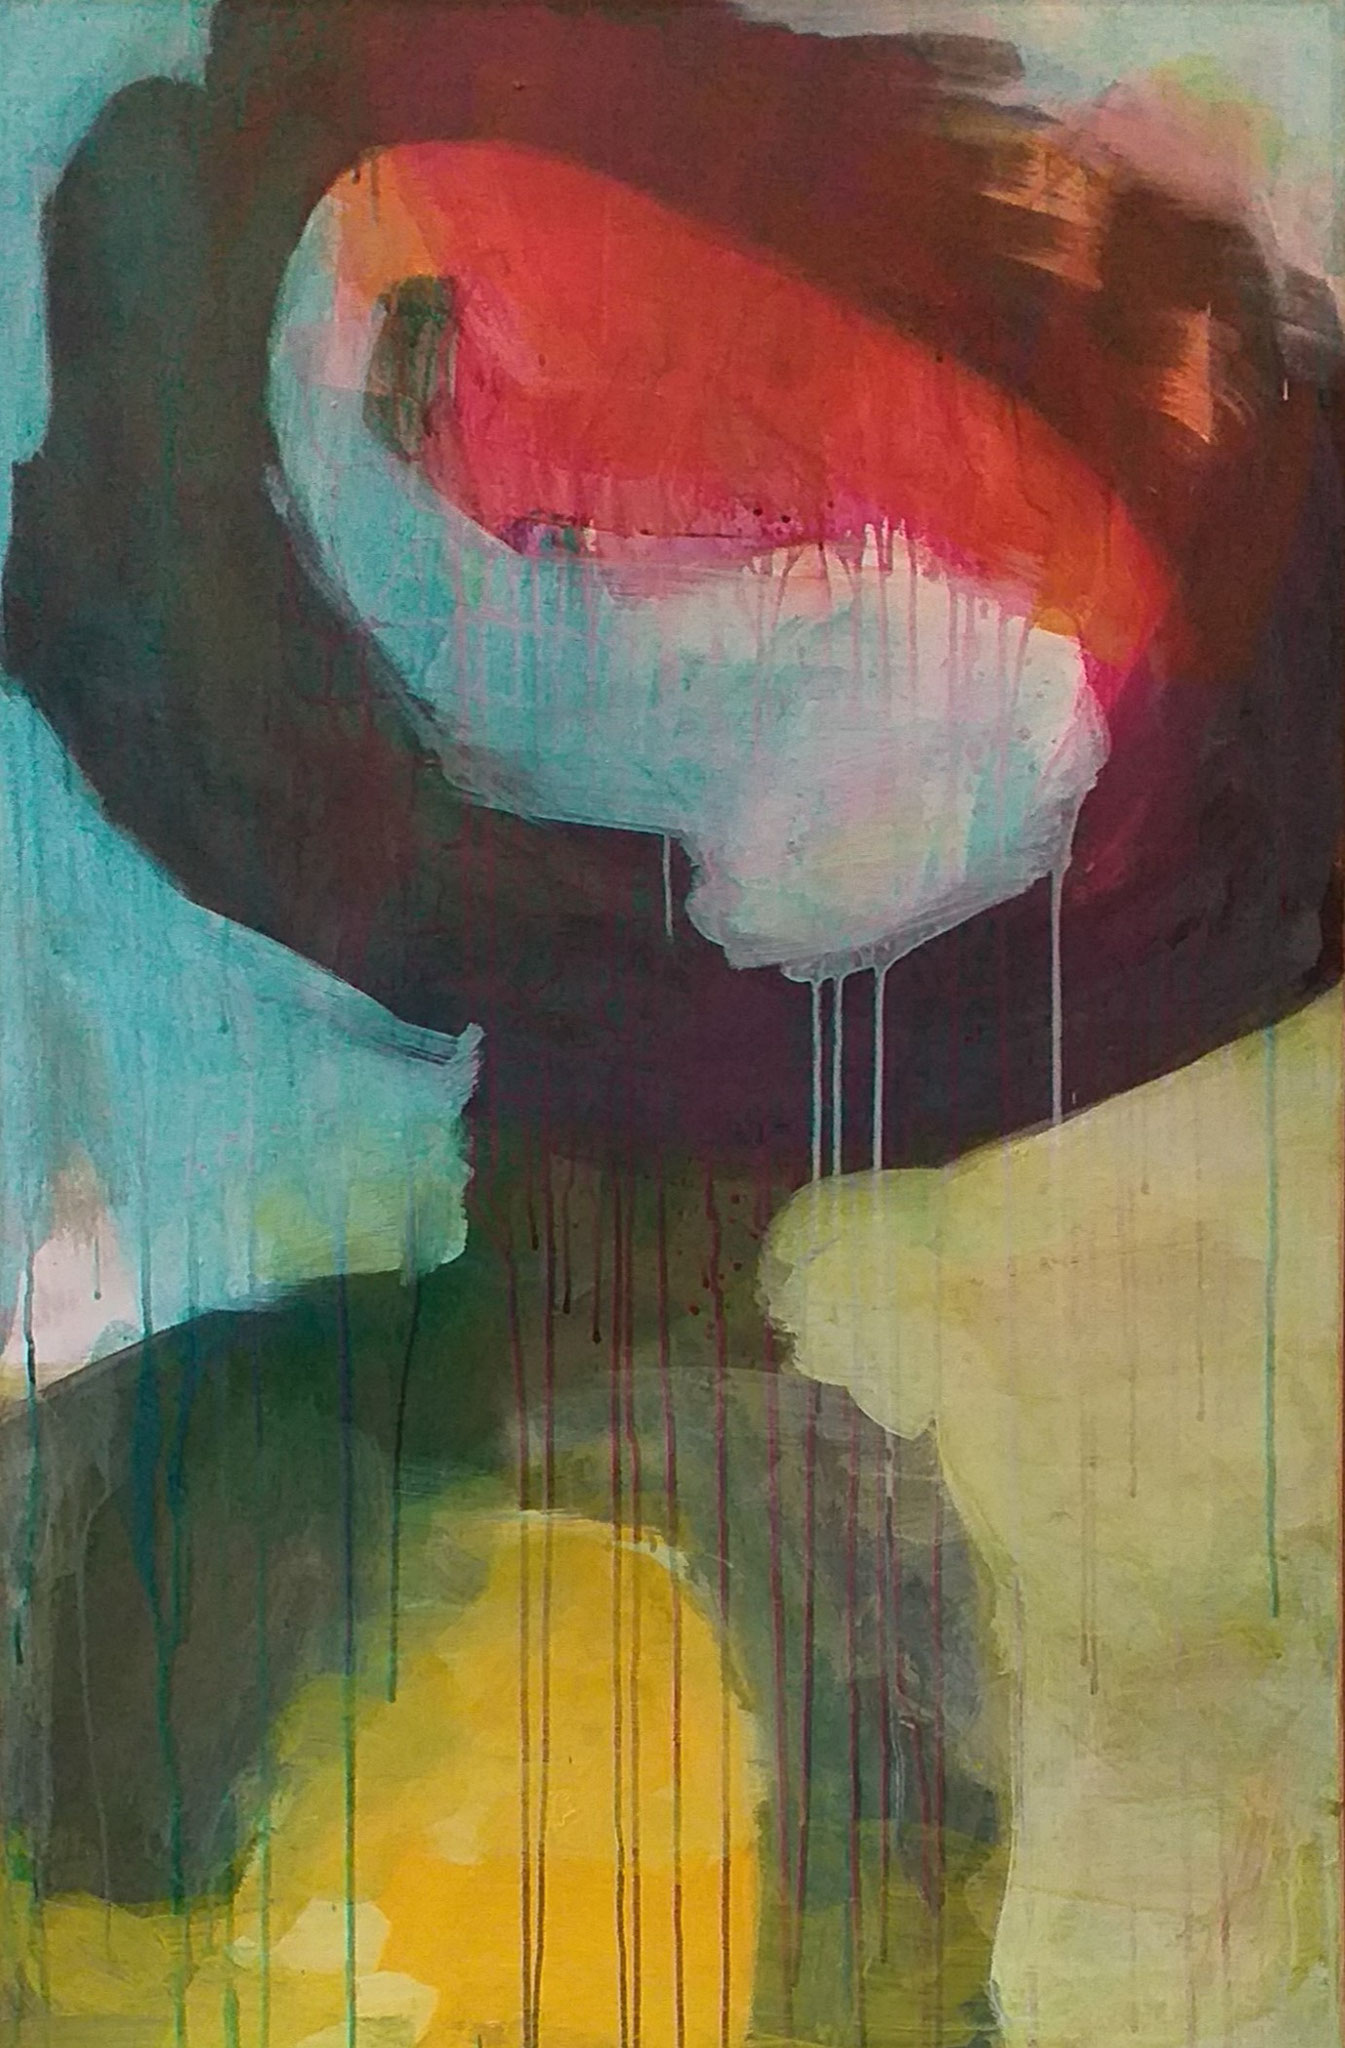 Acryl, ecoline op canvas  115x75 cm 2020 'Strength'